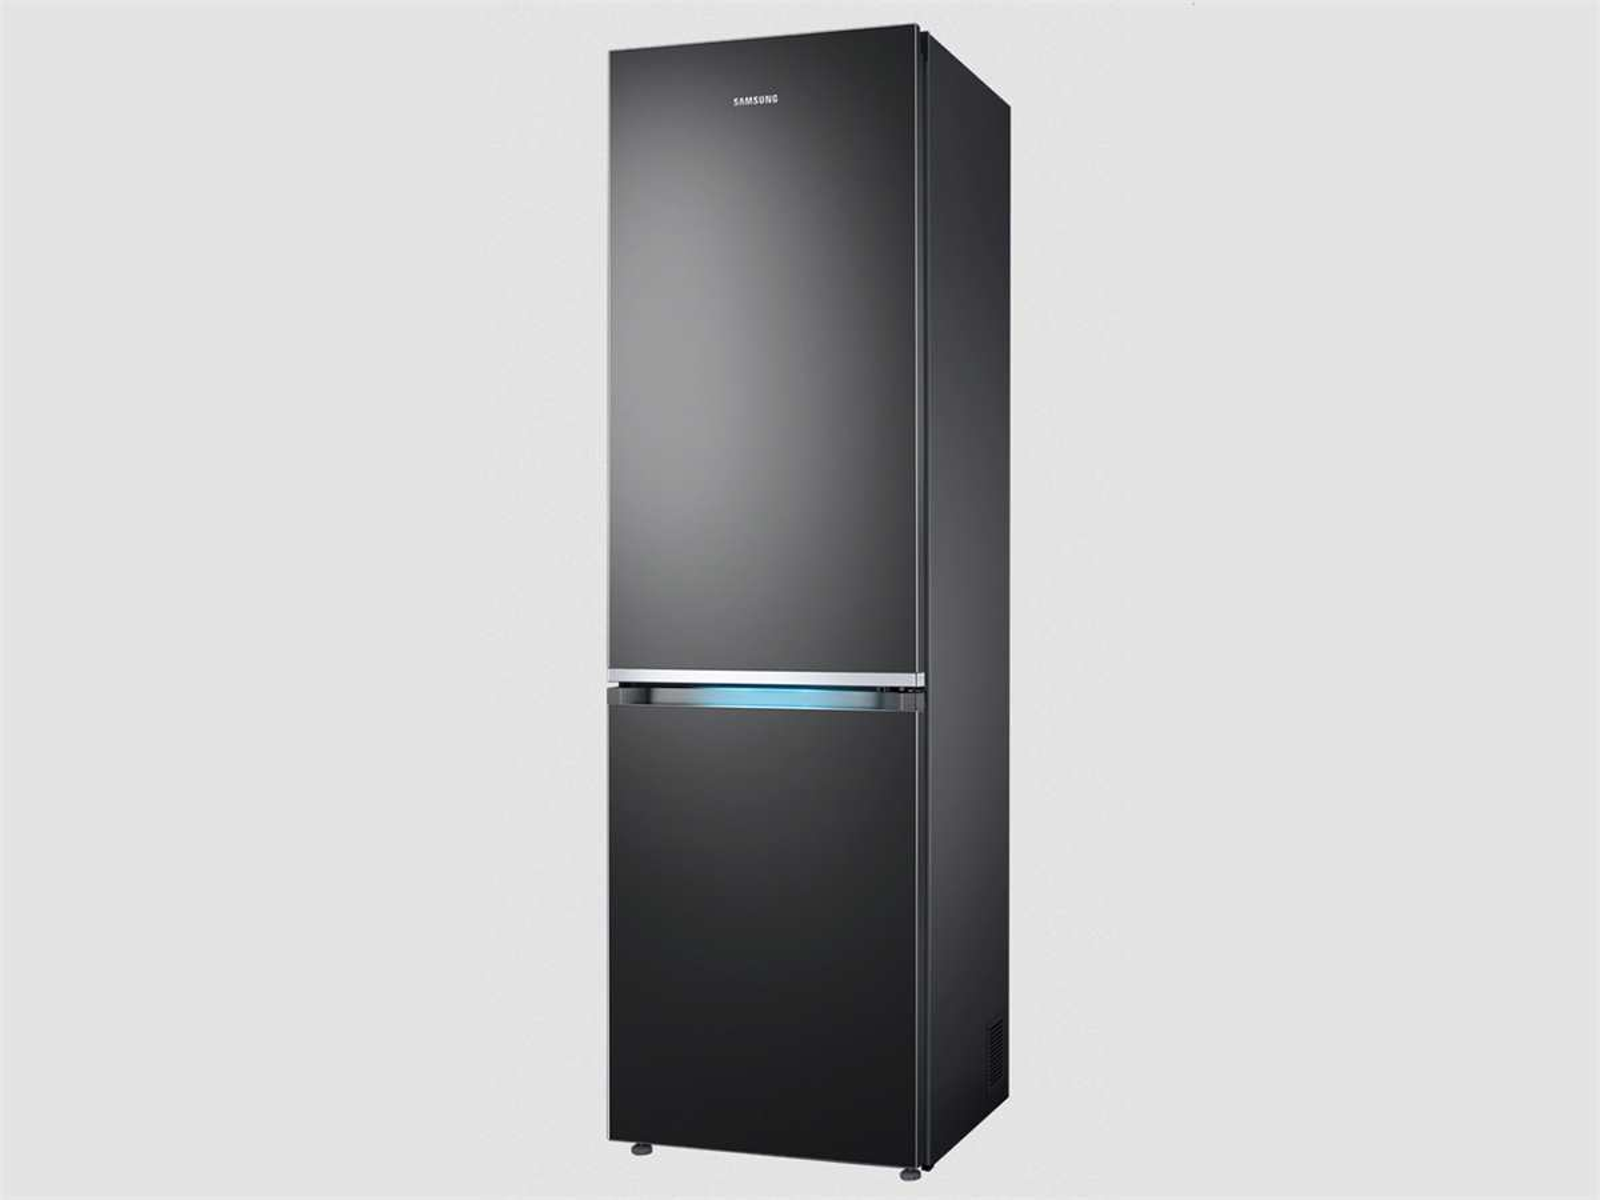 Samsung RL36R8739B1/EG Kühl-Gefrier-Kombination Premium Black Steel